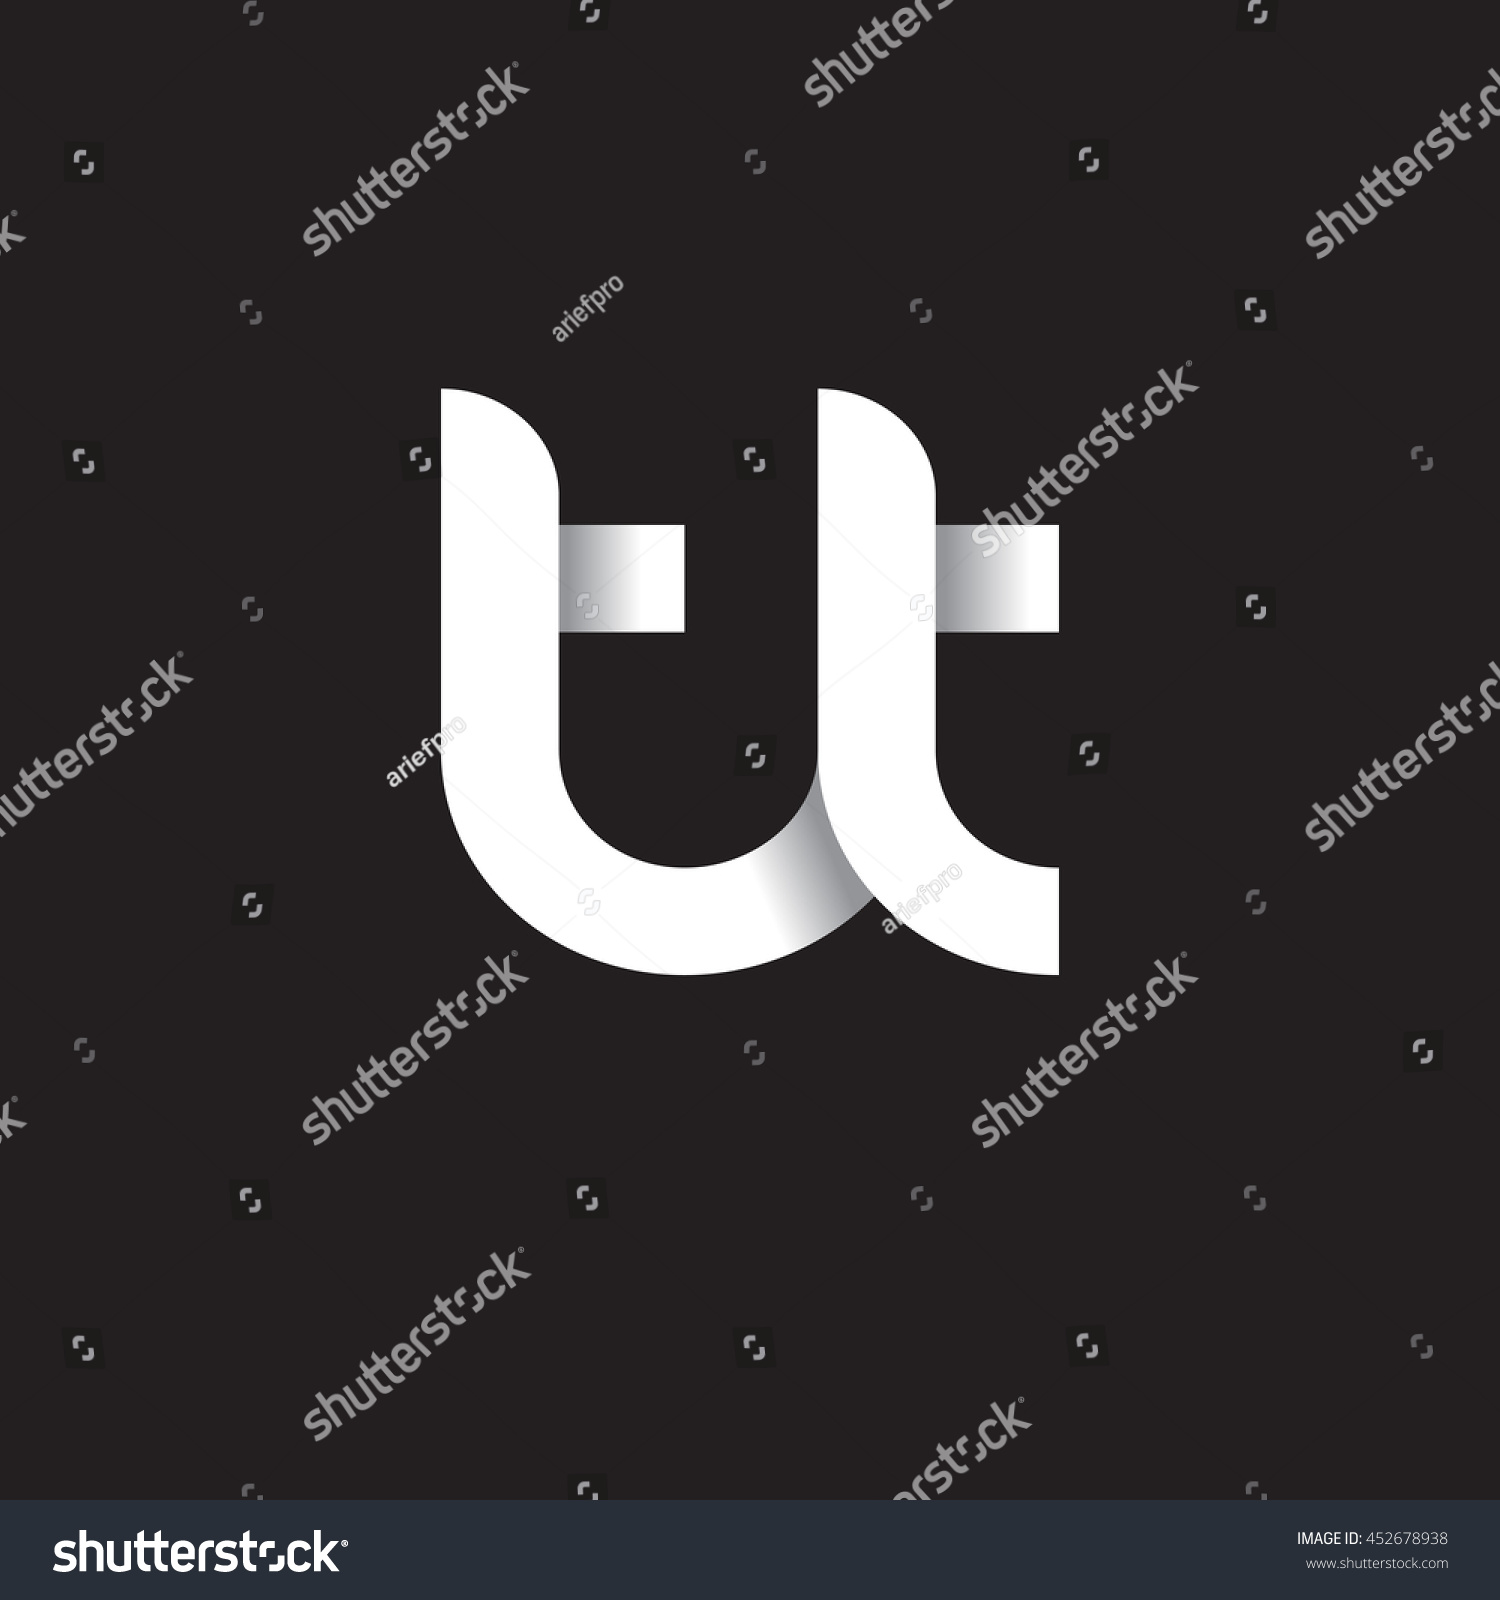 Tj initial luxury ornament monogram logo stock vector - Initial Letter Tt Modern Linked Circle Round Lowercase Logo White Black